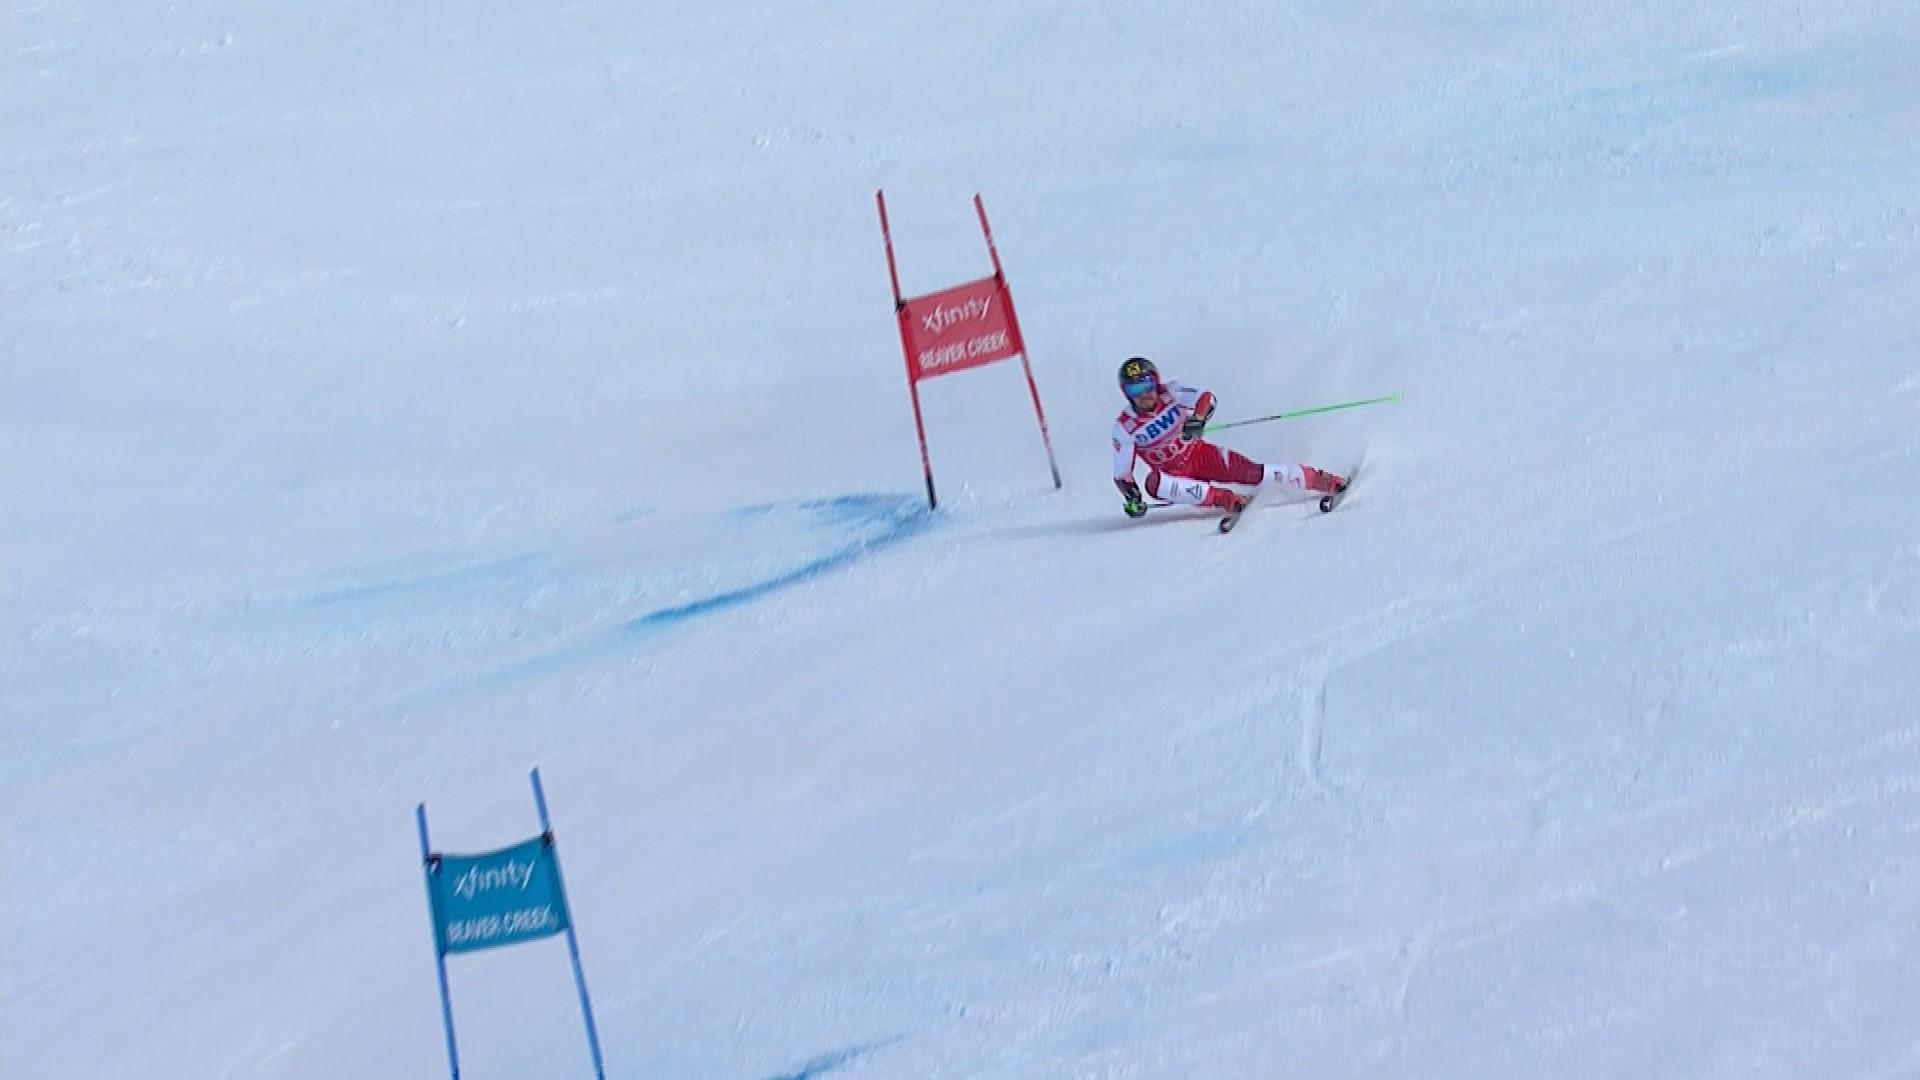 Alpine skiing : Hirscher 2nd run in Beaver Creek